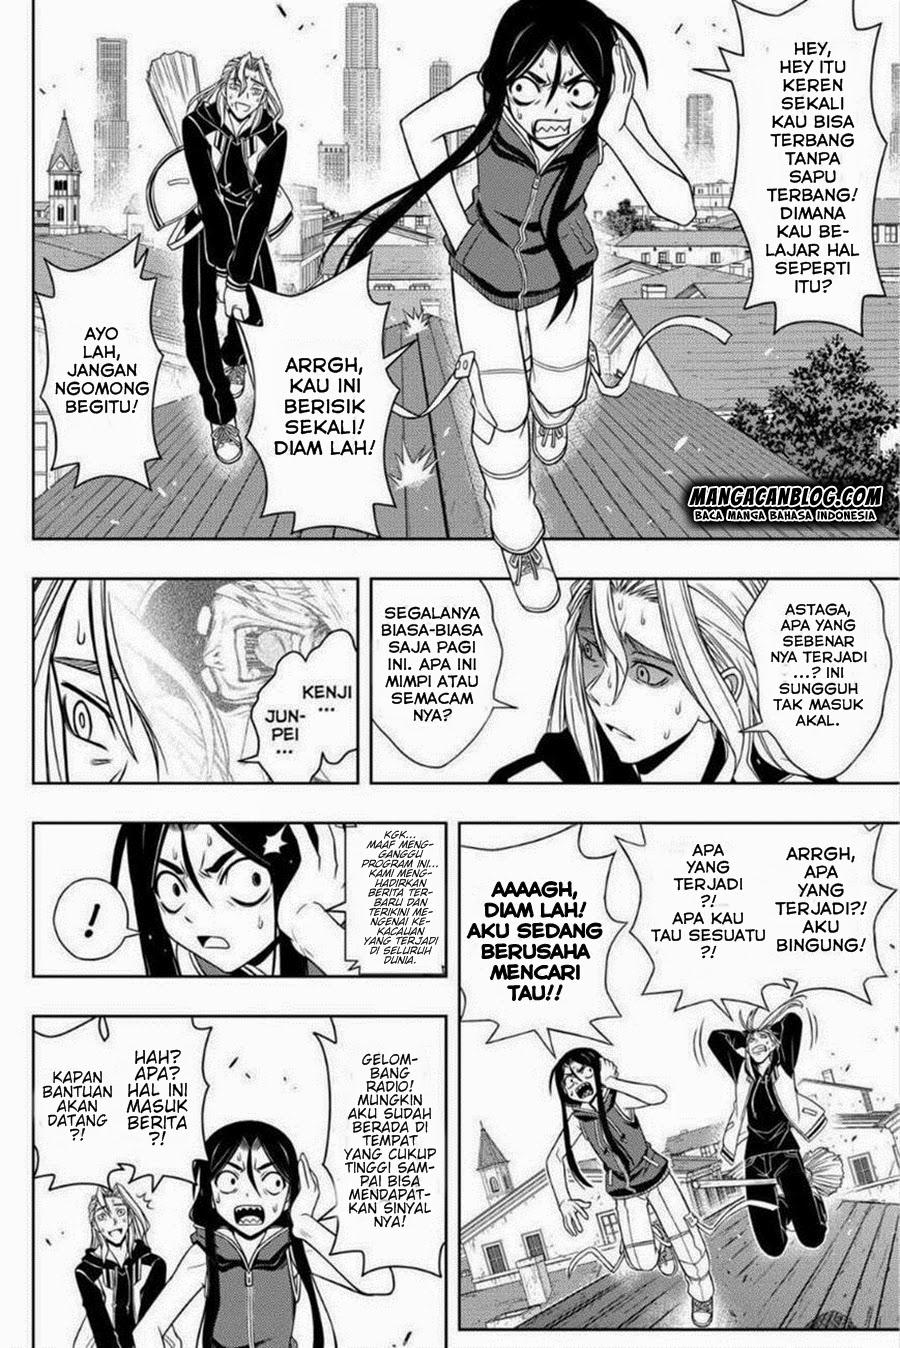 Komik uq holder 055 - sampai jumpa 56 Indonesia uq holder 055 - sampai jumpa Terbaru 15|Baca Manga Komik Indonesia